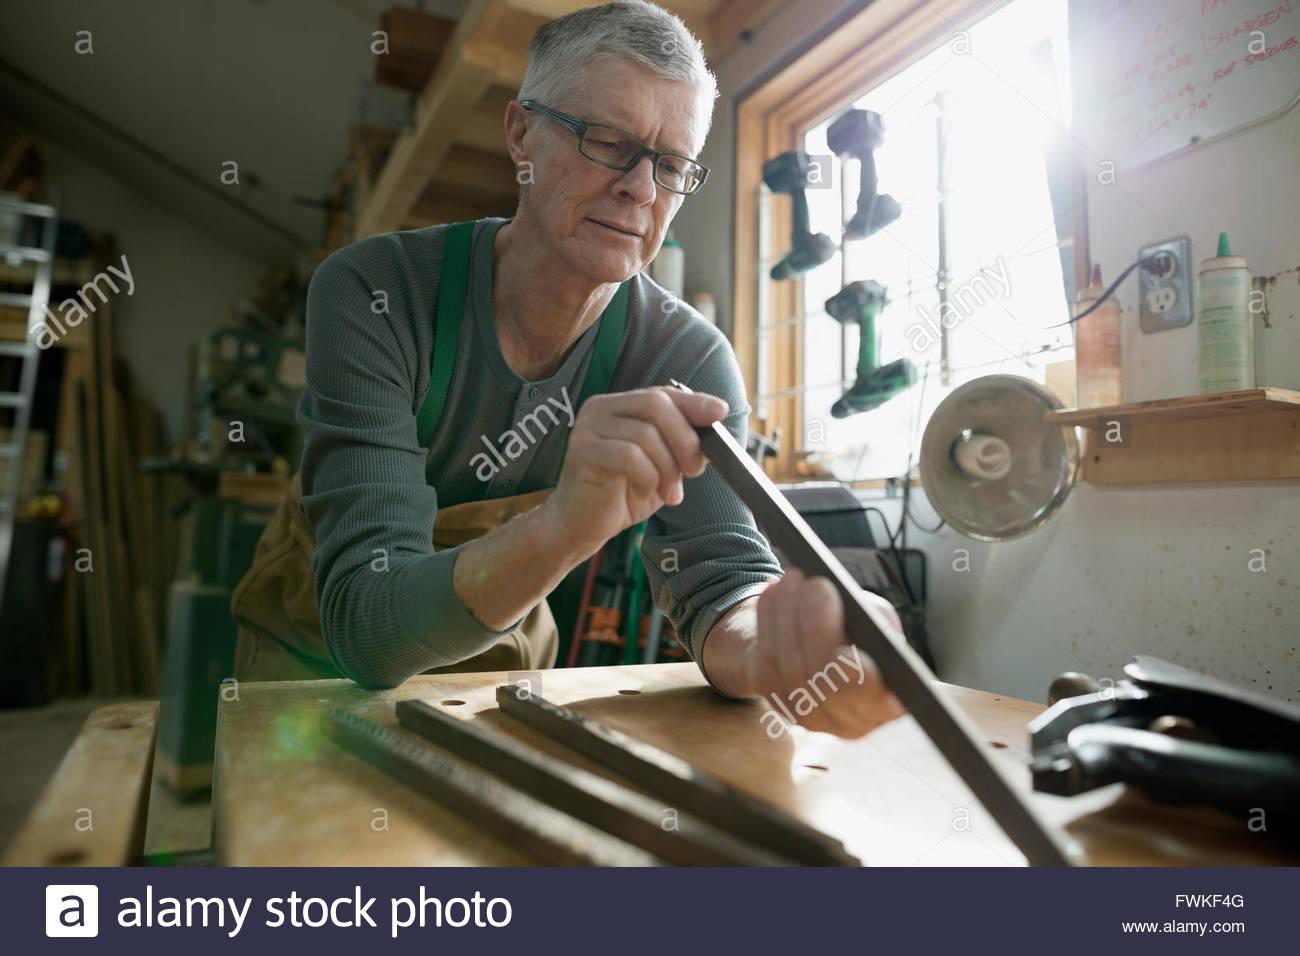 Carpenter examining tools in workshop - Stock Image